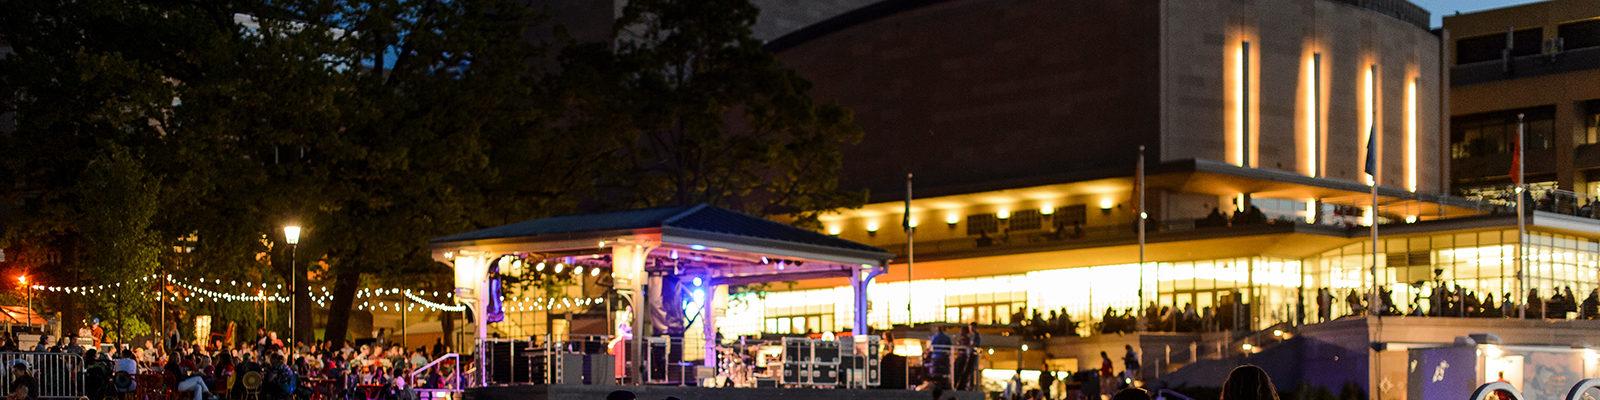 Memorial Union Terrace at night